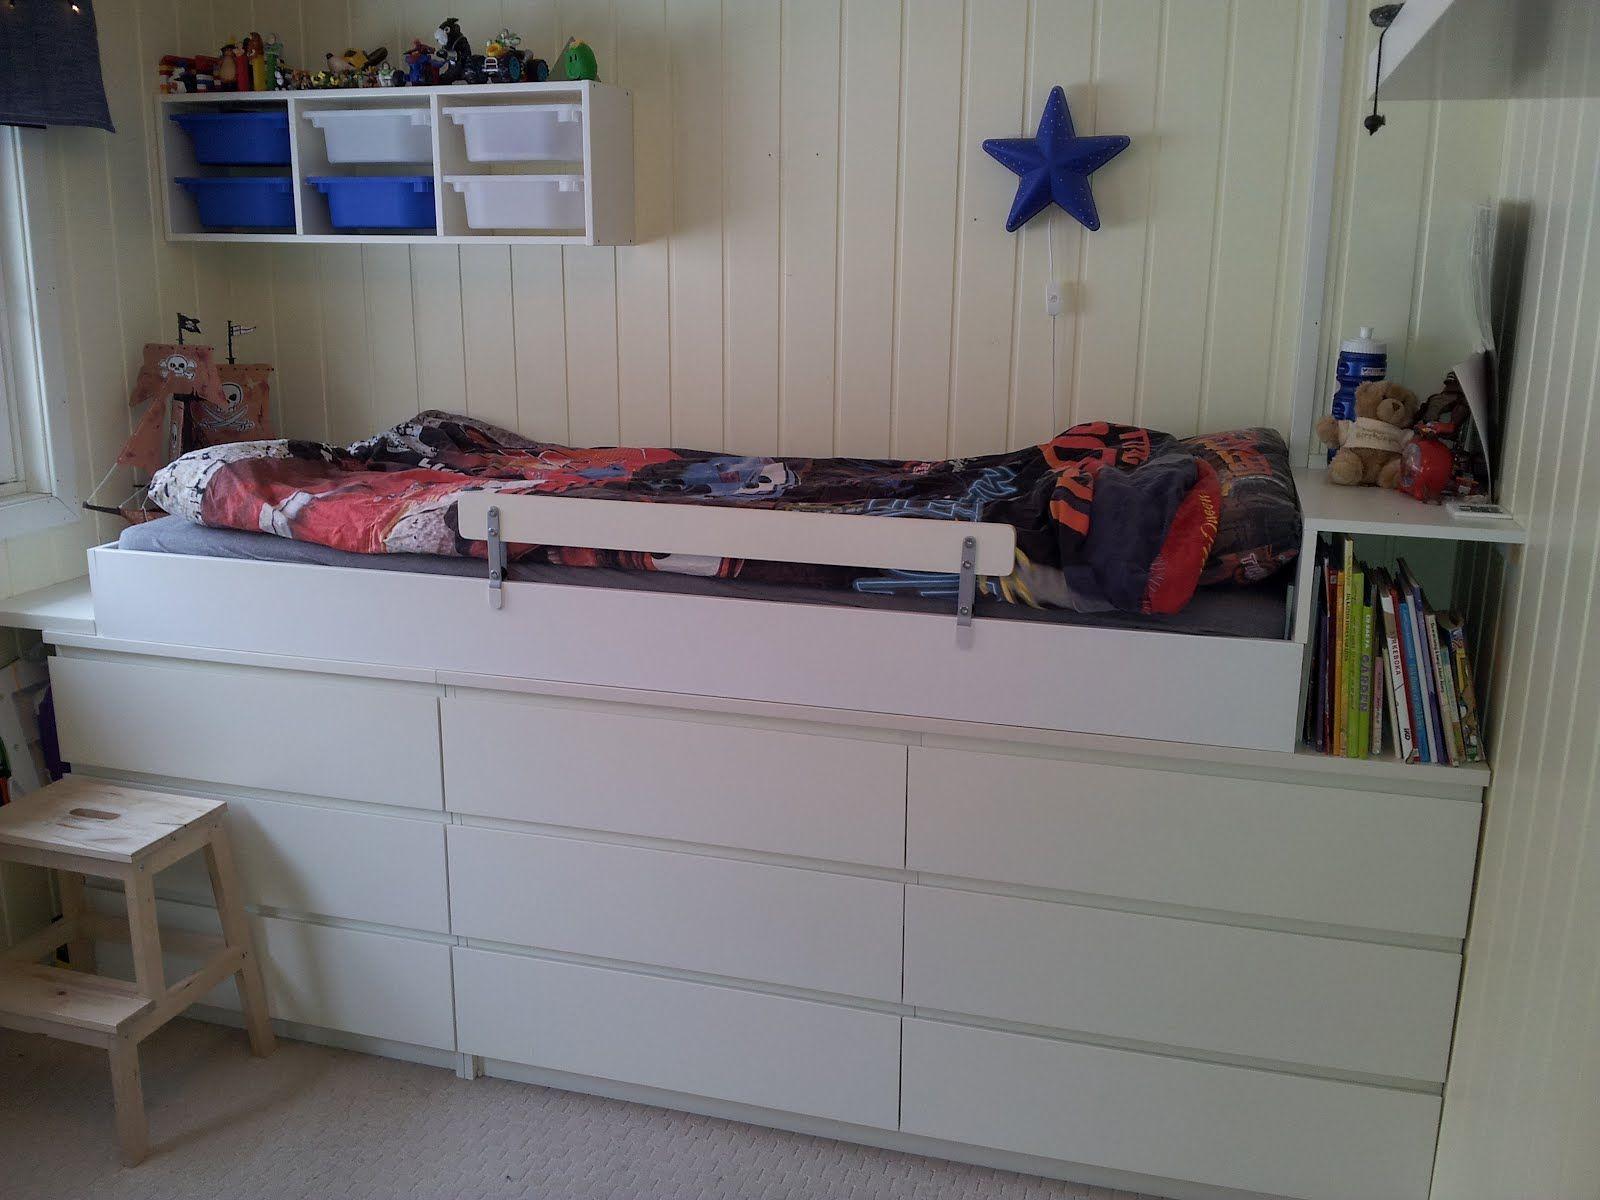 malm seng ikea malm seng kommode   Google søk | Boys Room in 2018  malm seng